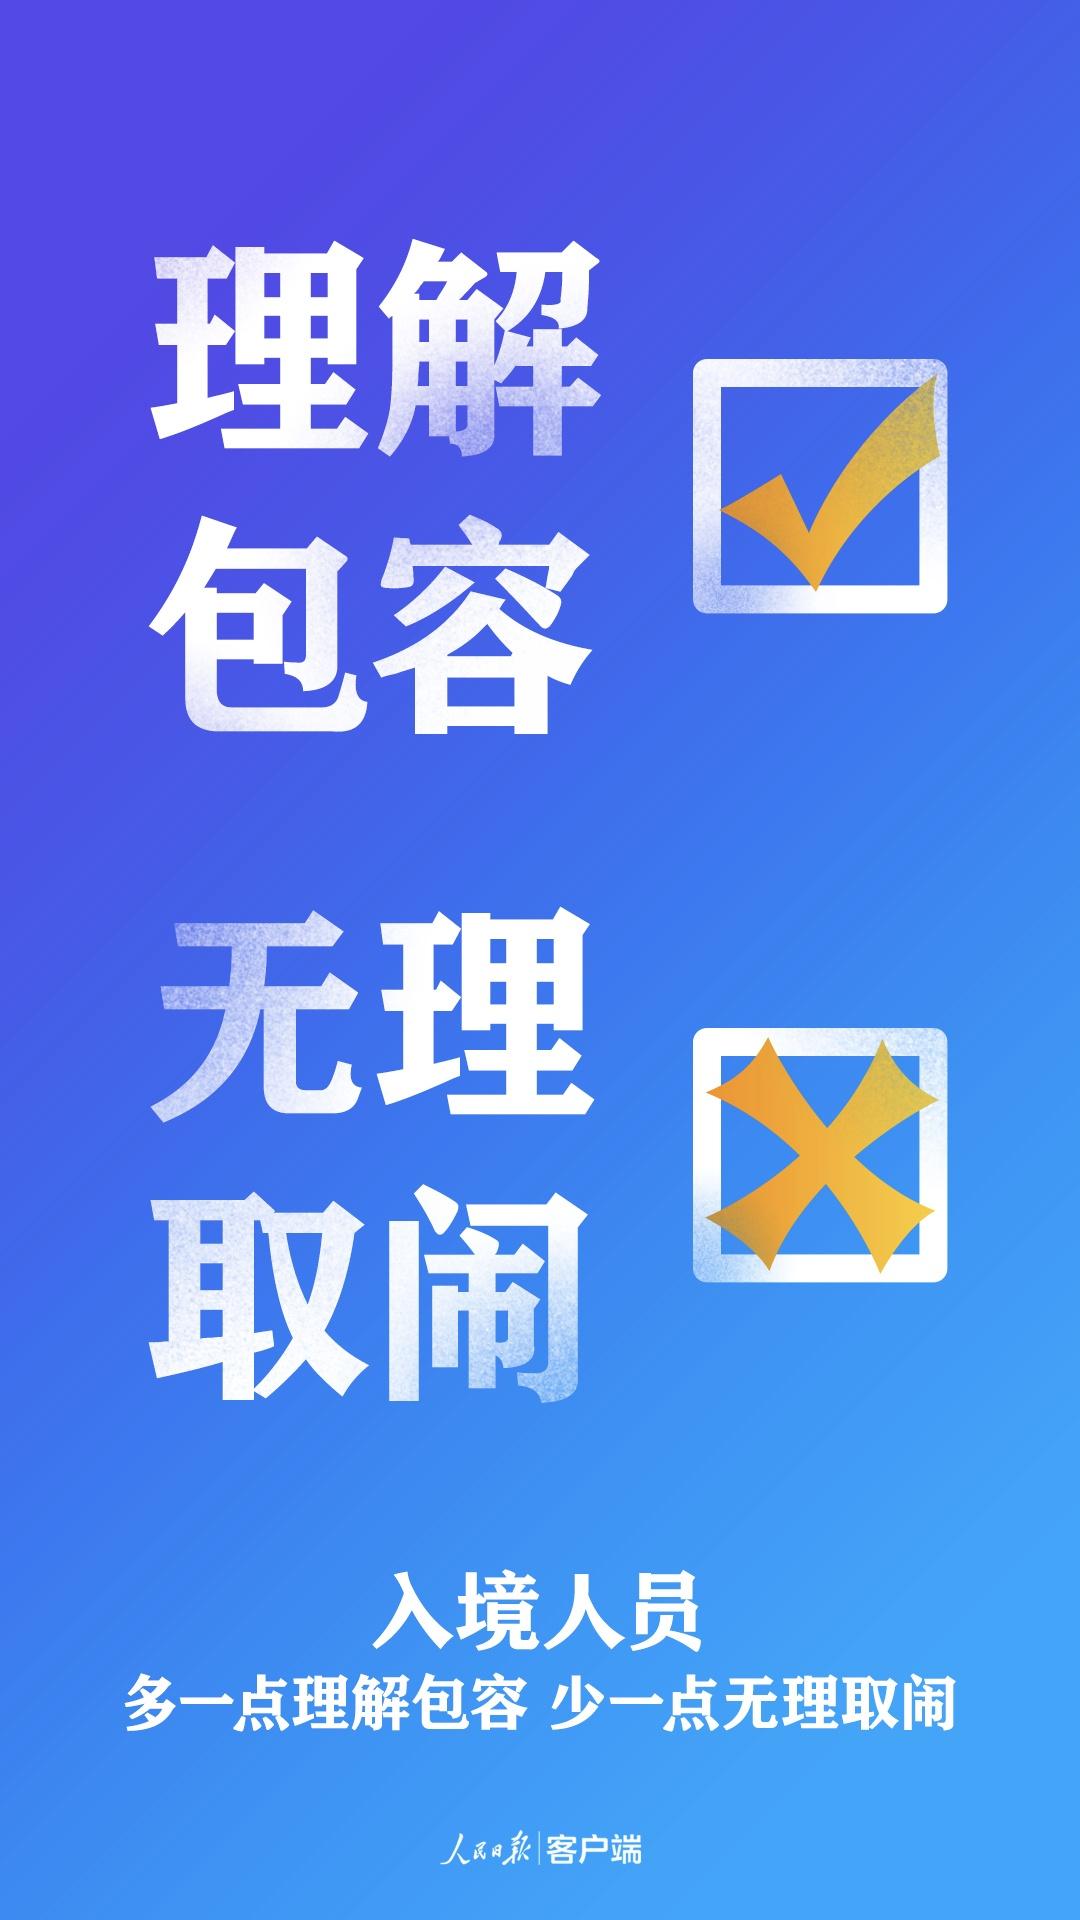 image.png?x-oss-process=style/w10